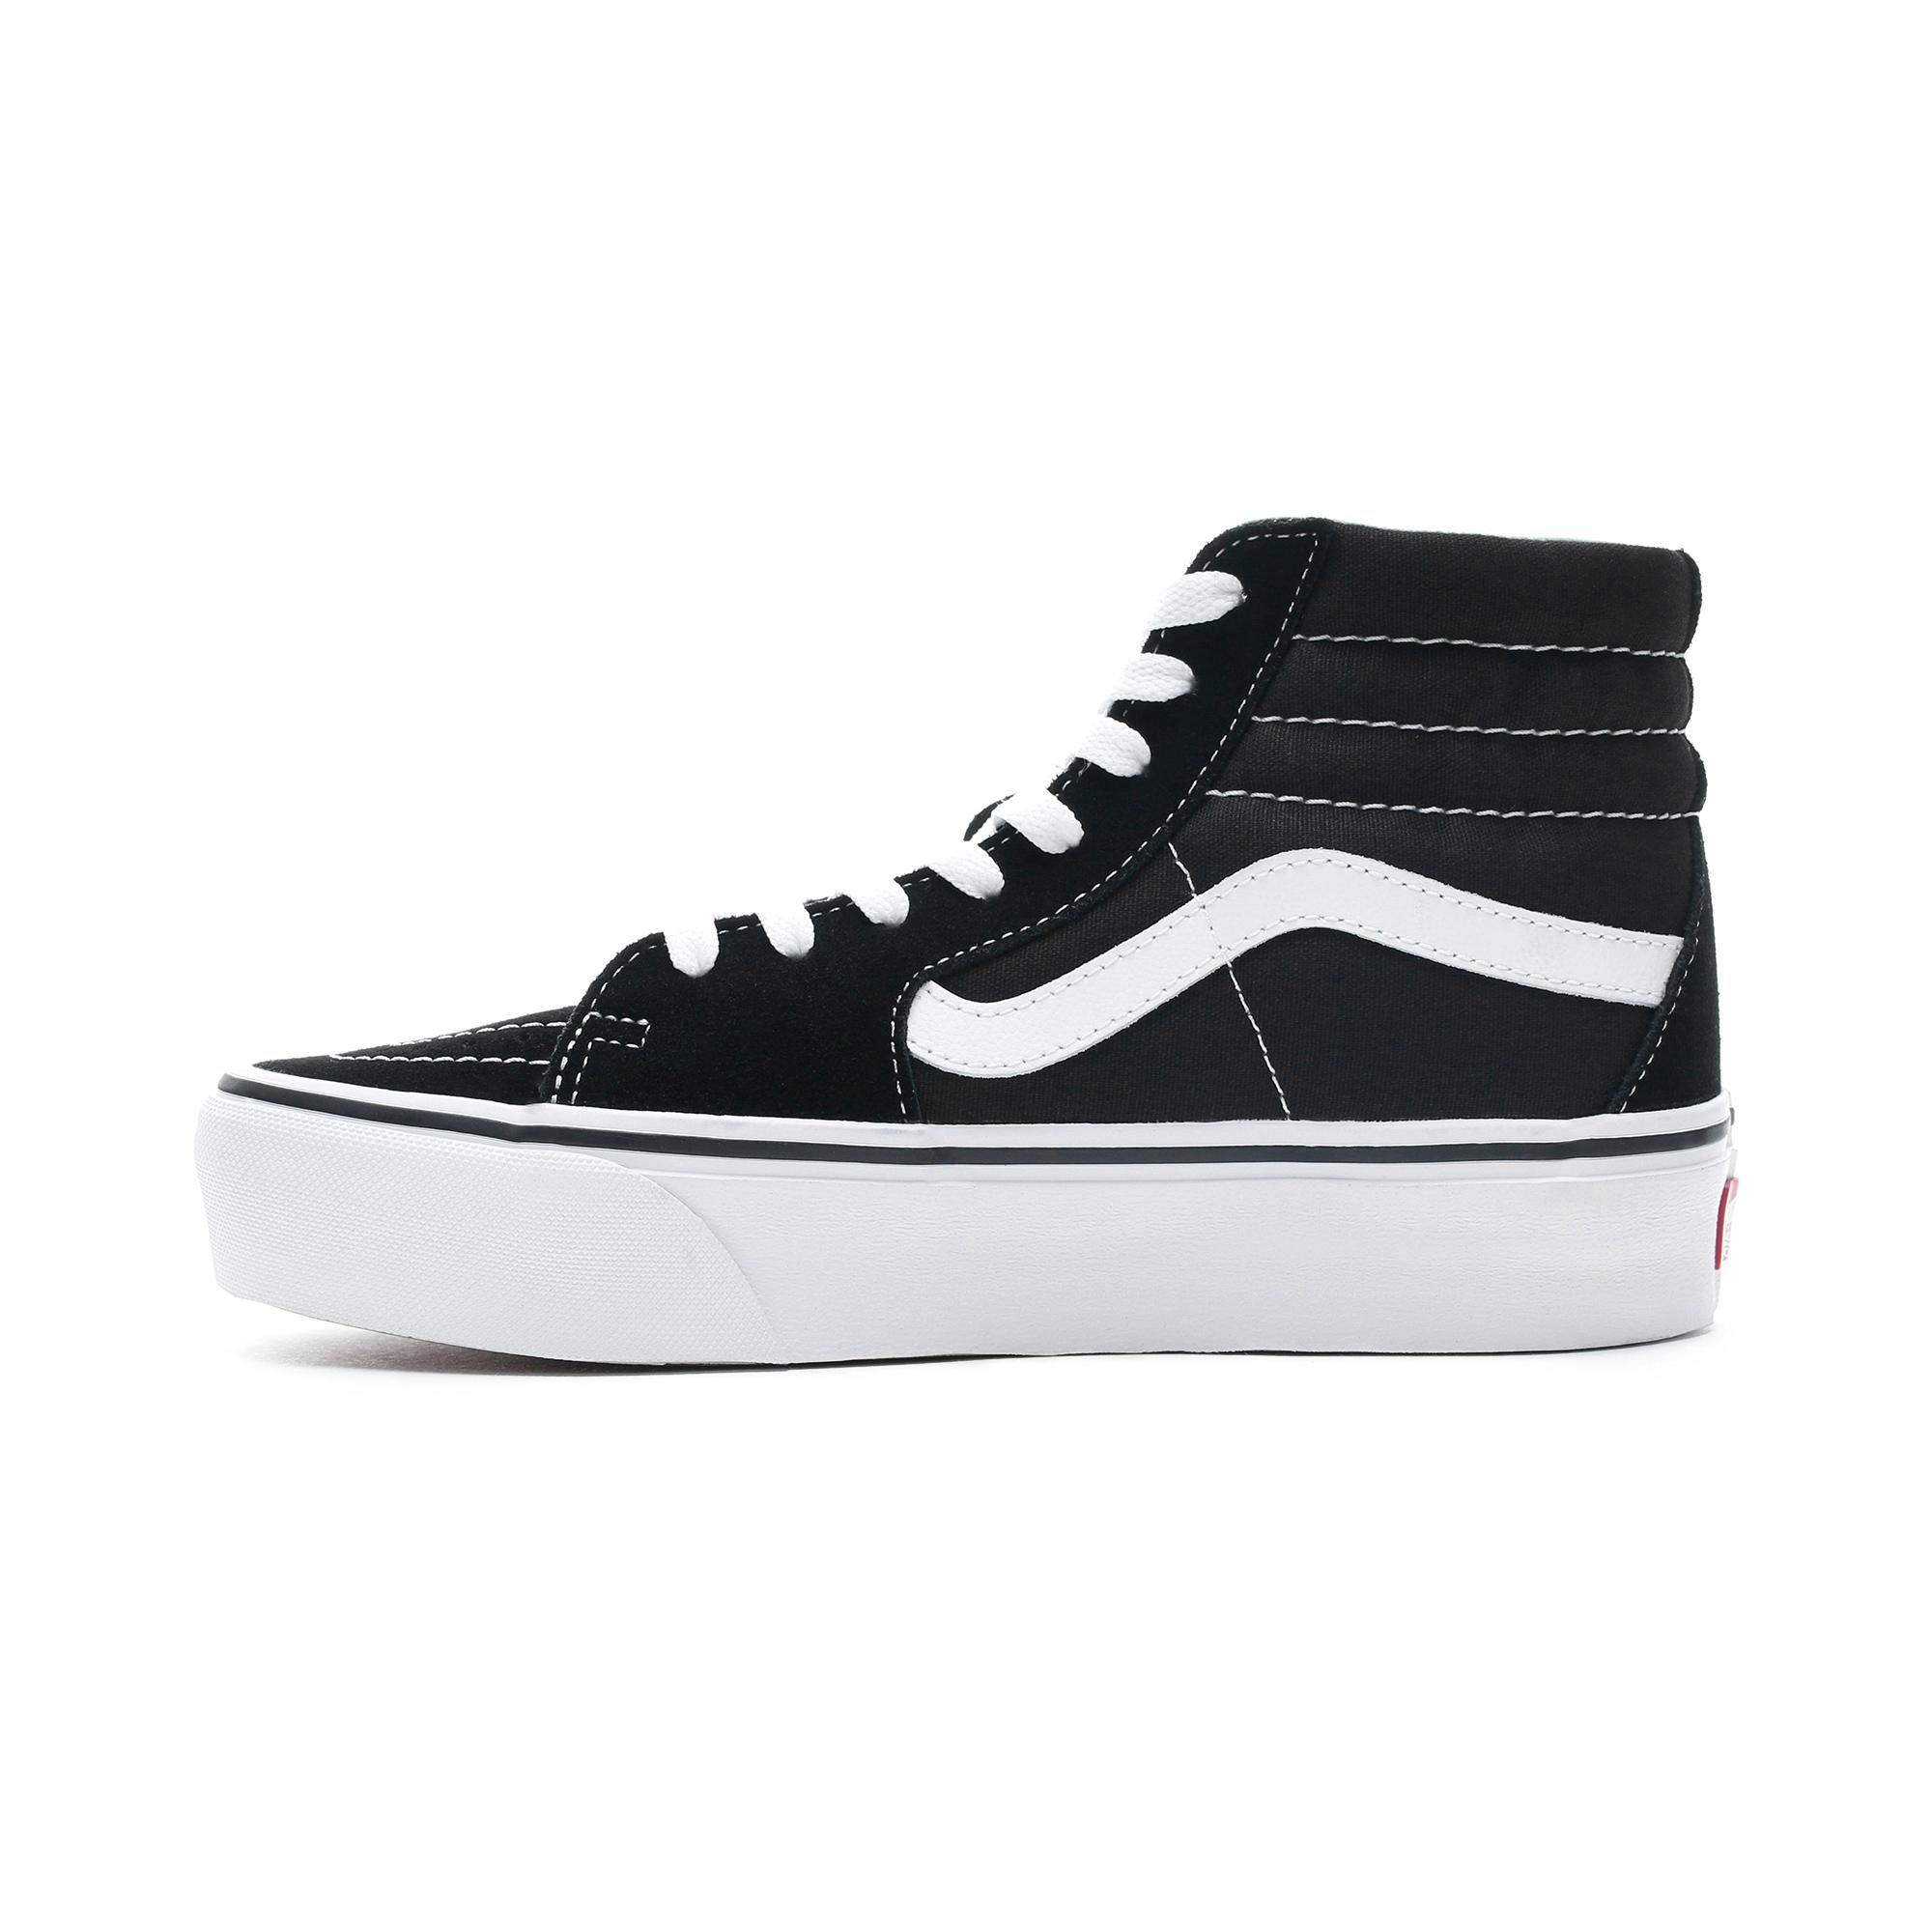 Vans Sk8-Hi Platform 2.0 Siyah Kadın Sneaker